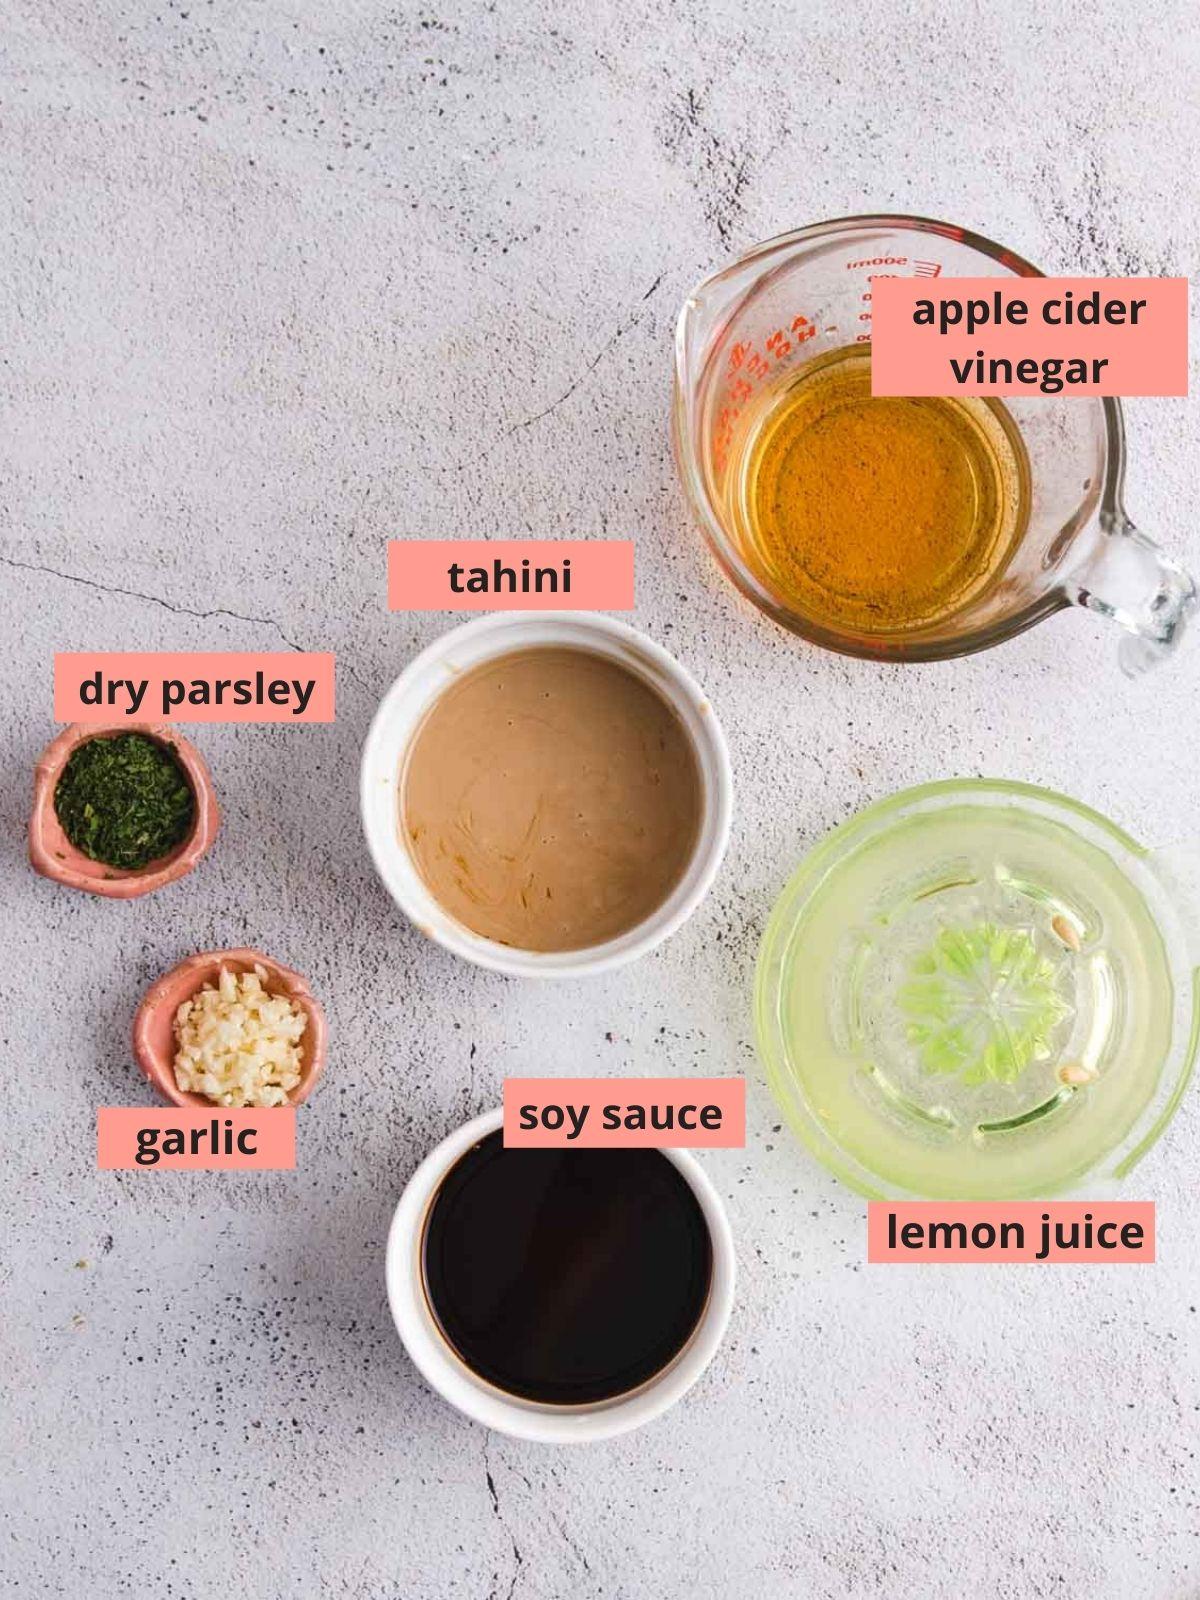 Labeled ingredients used to make tahini dressing